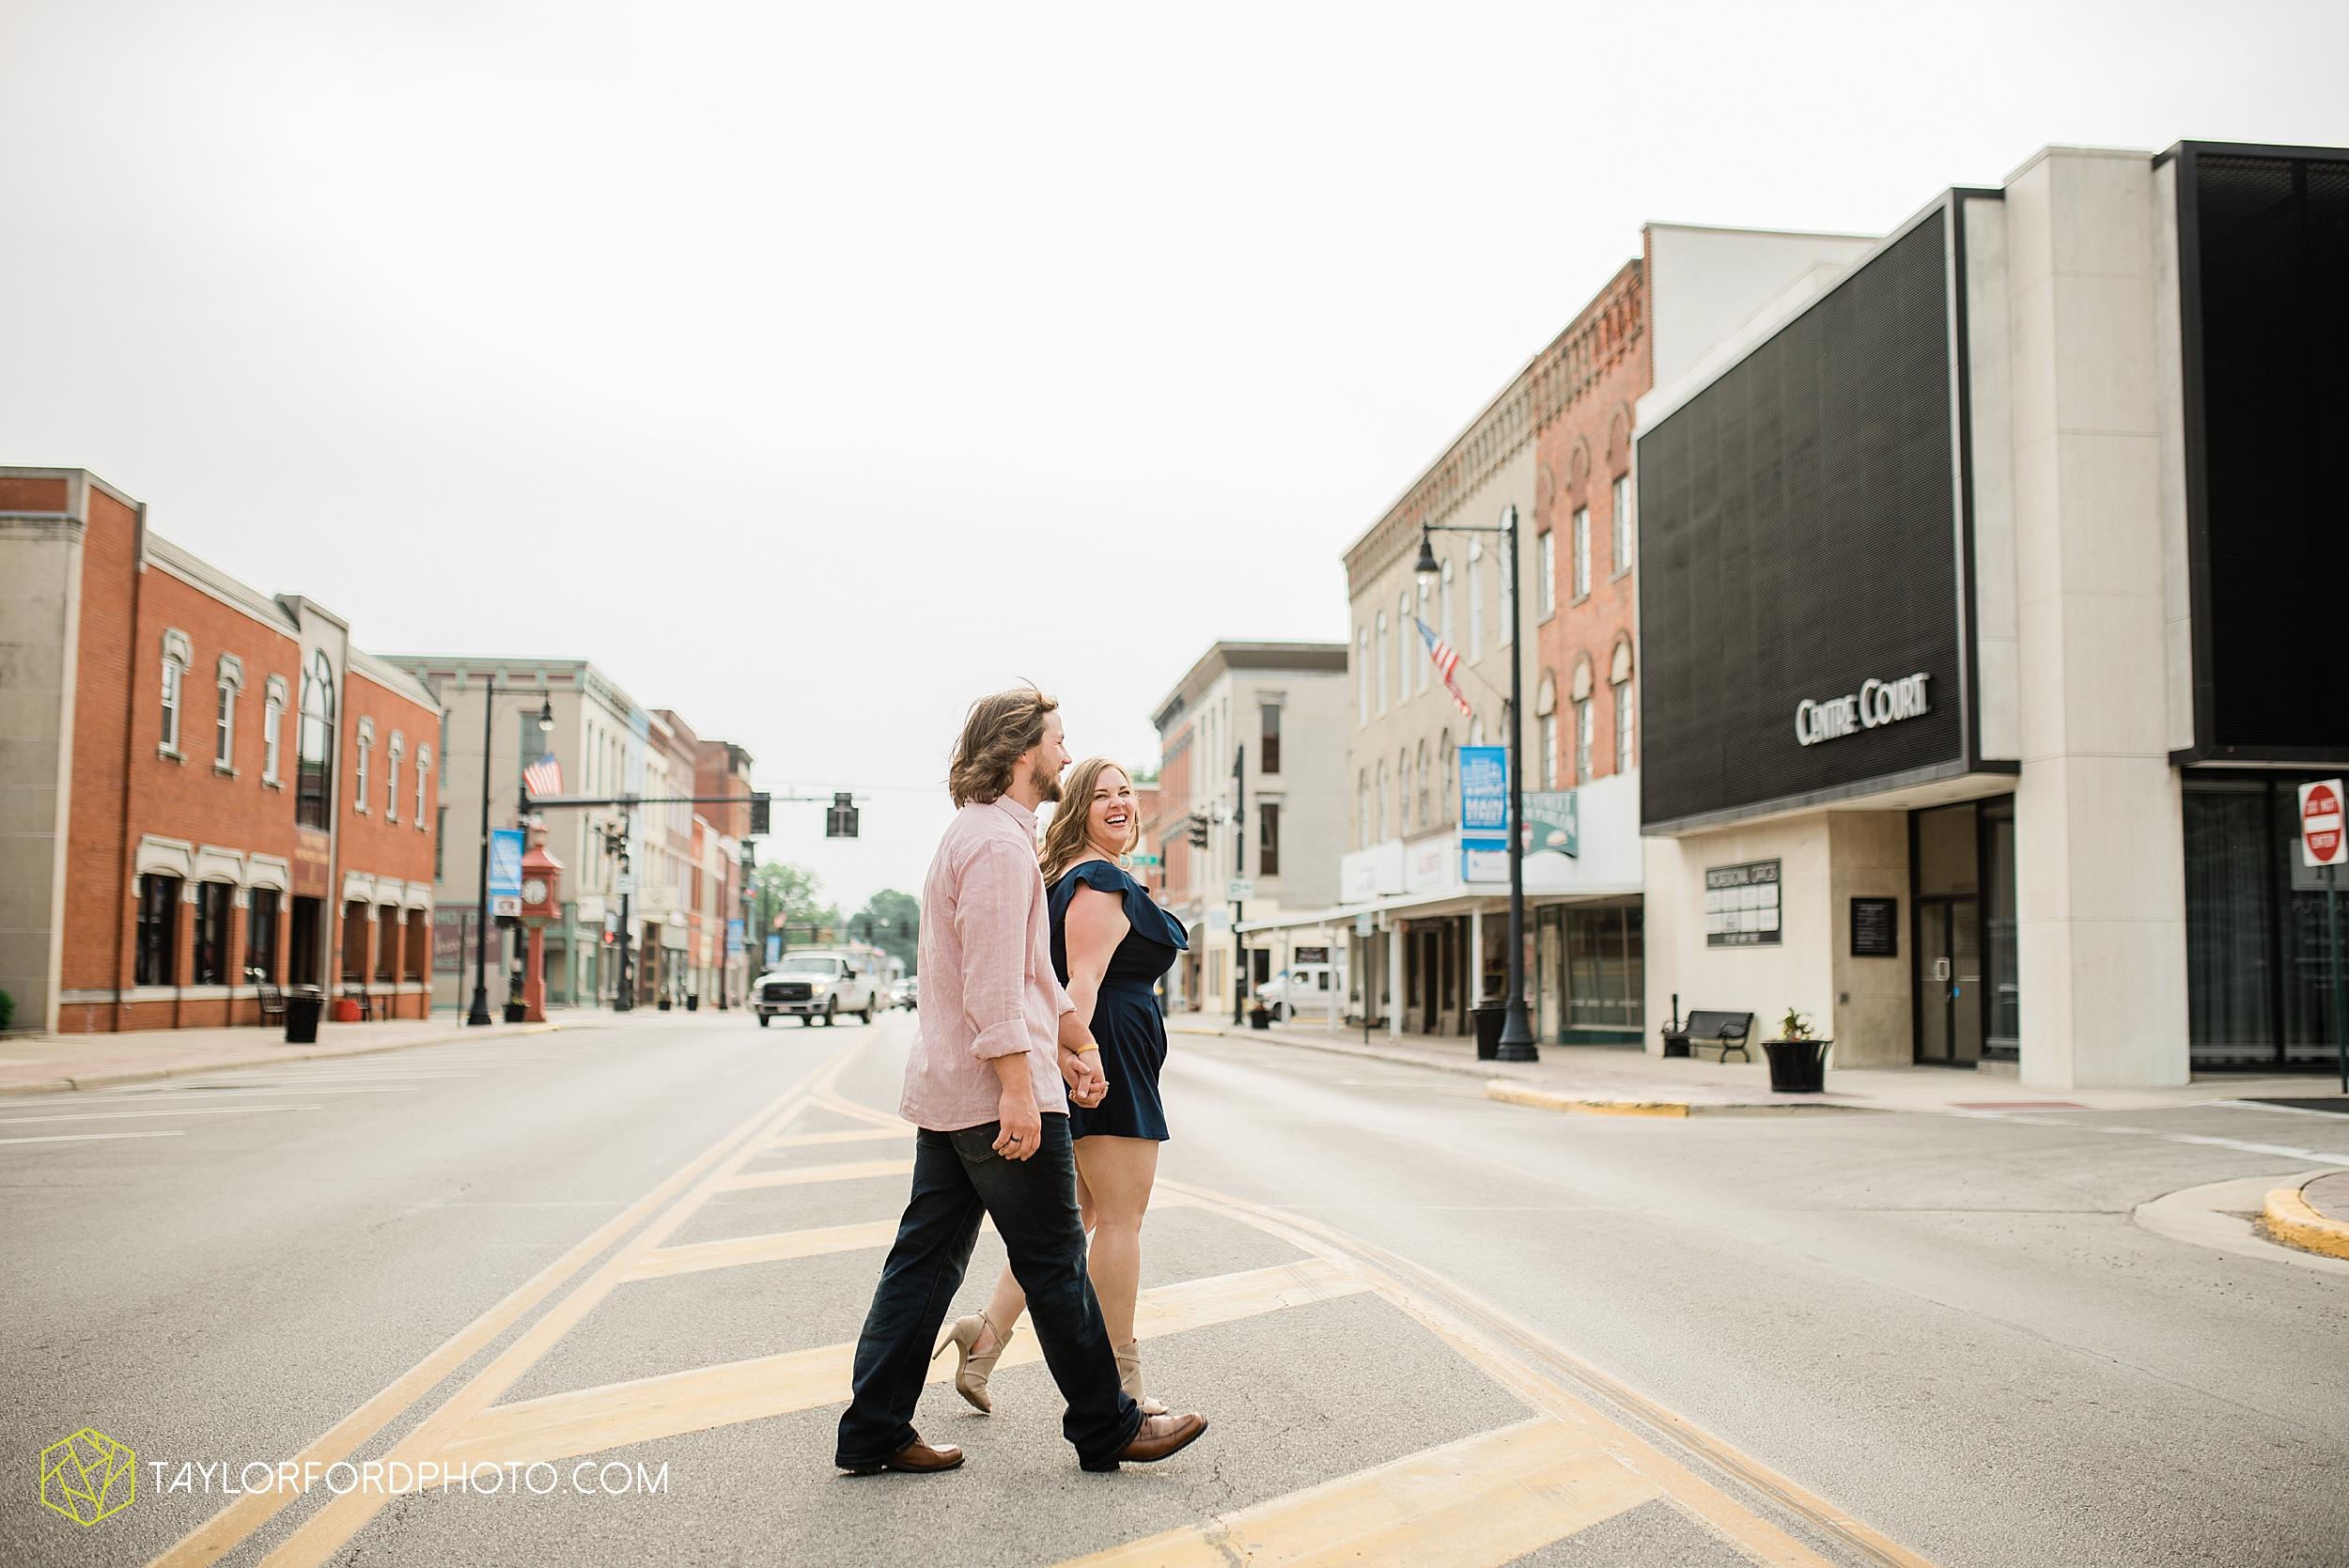 northwest-downtown-nature-summer-van-wert-ohio-engagement-photography-taylor-ford-hirschy-photographer_3158.jpg